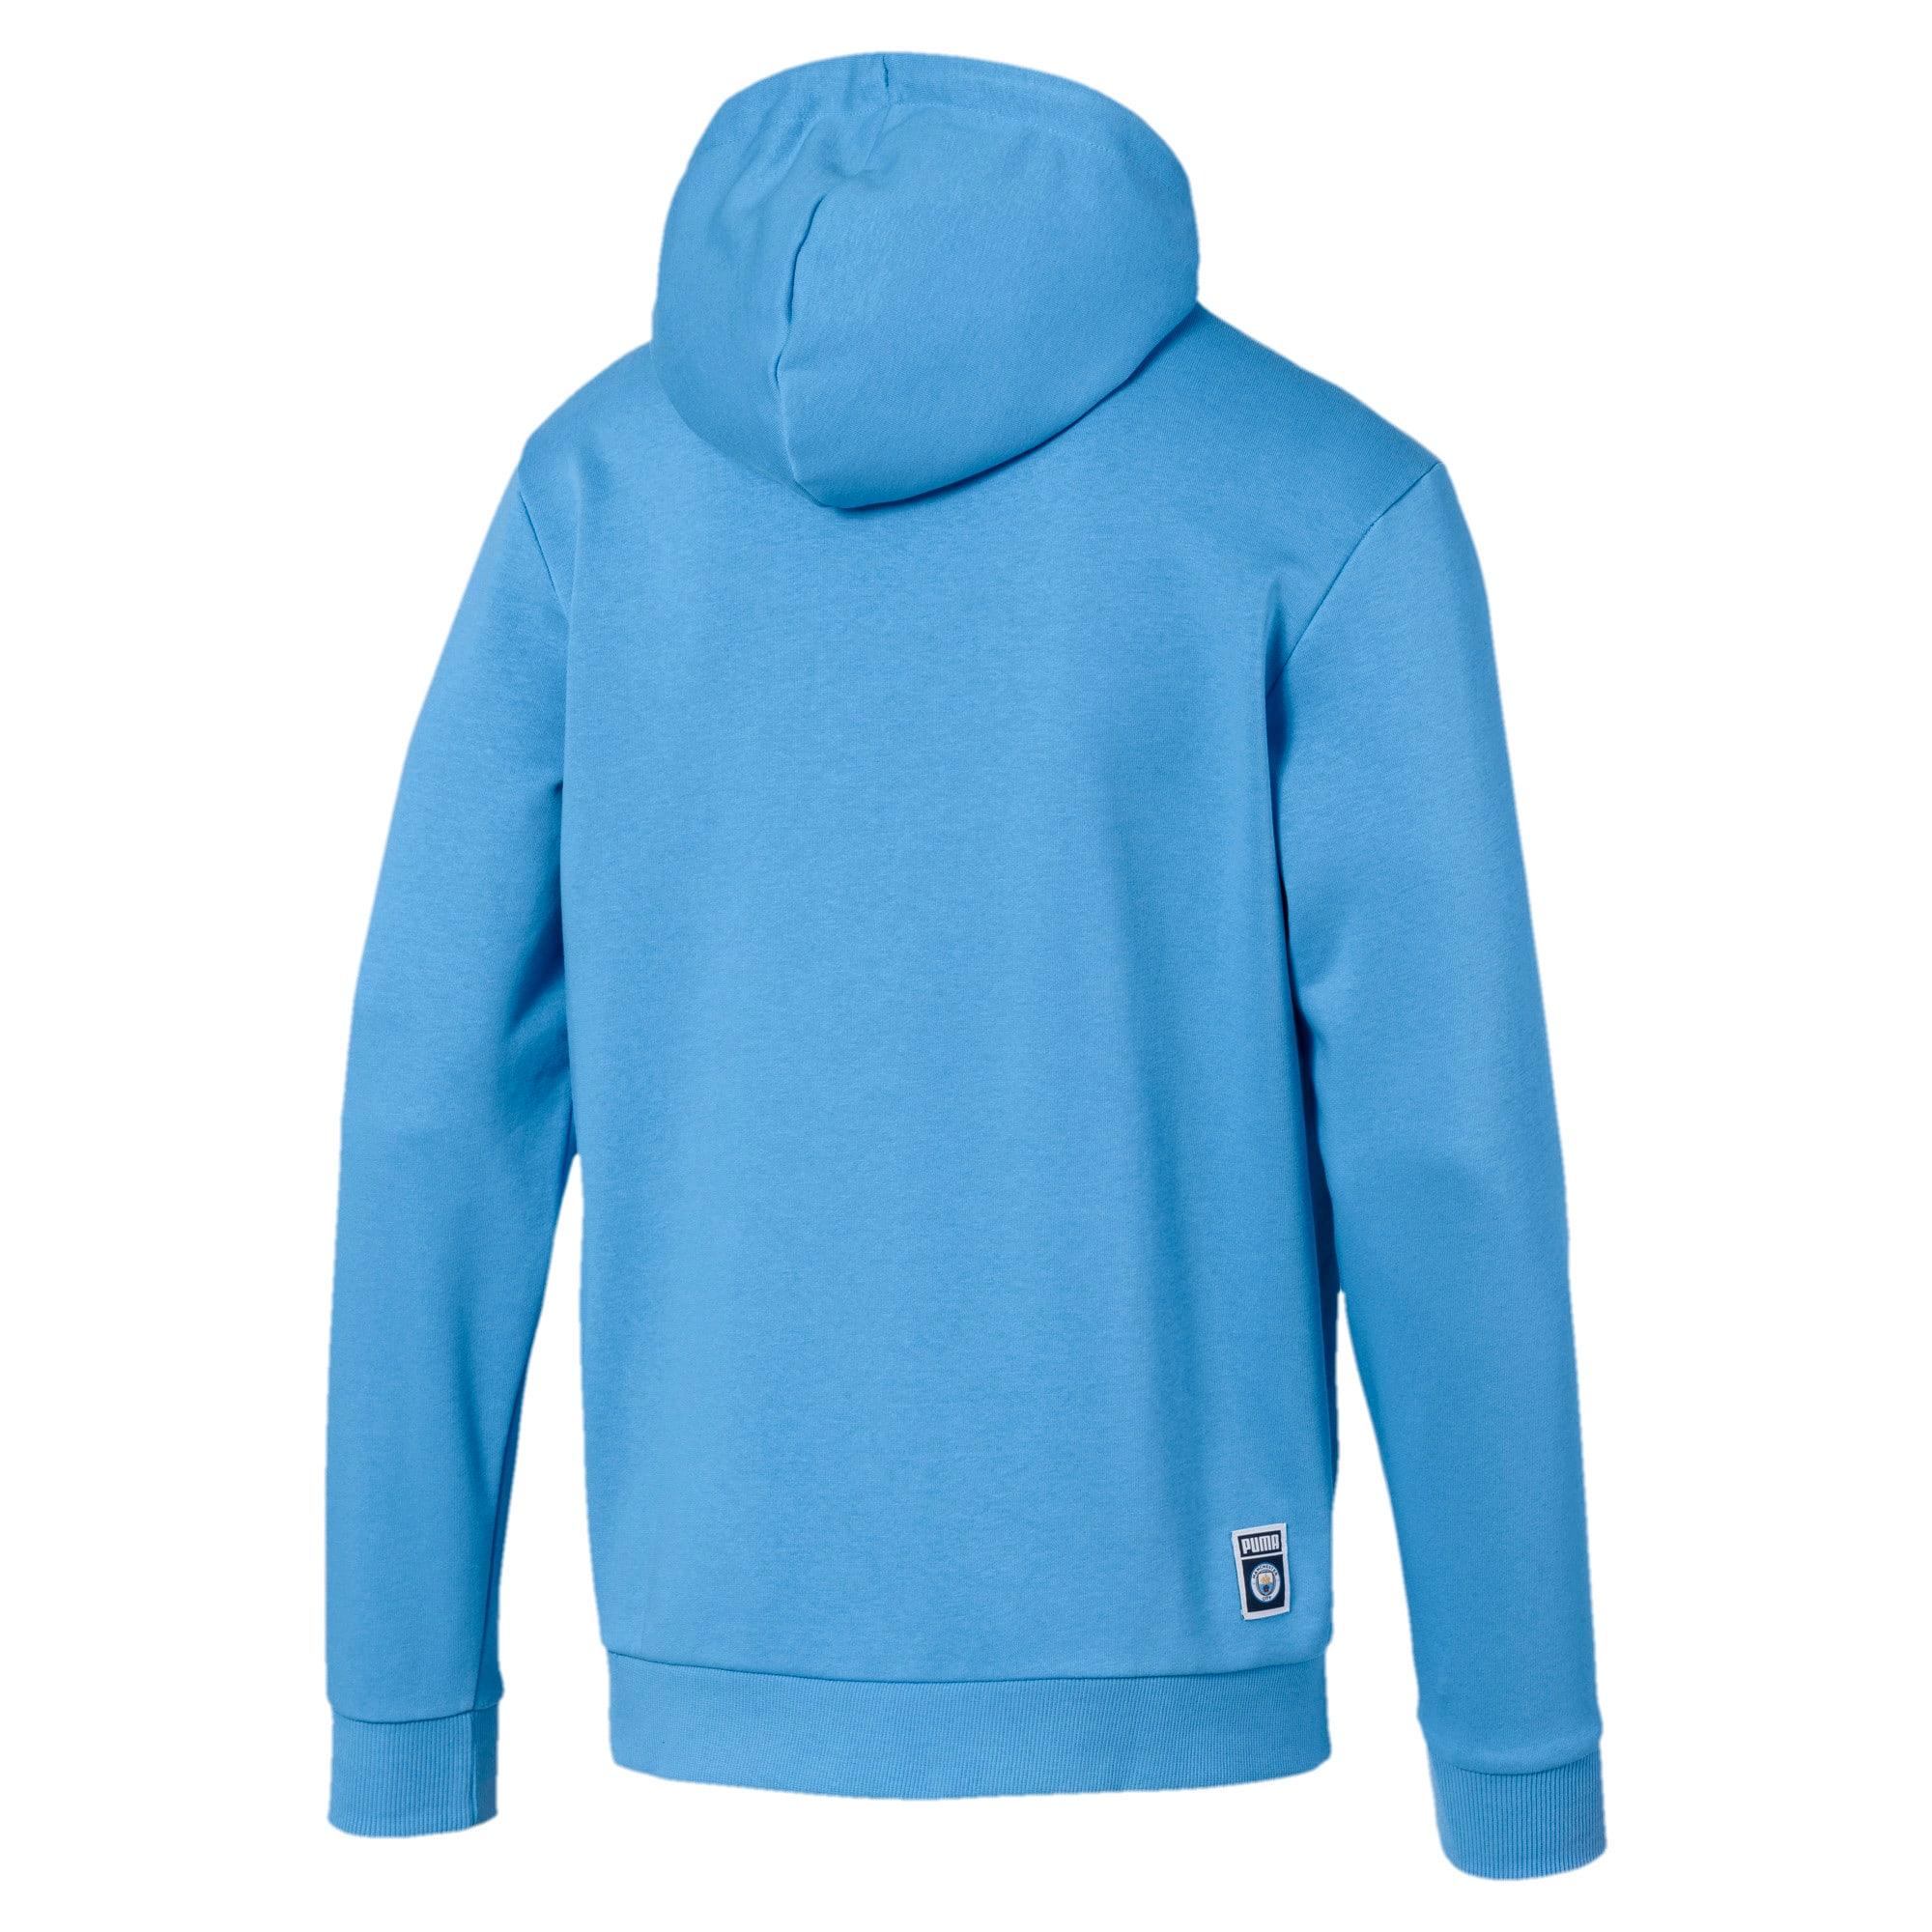 Thumbnail 2 of Manchester City FC Men's Shoe Tag Hoodie, Team Light Blue-Puma White, medium